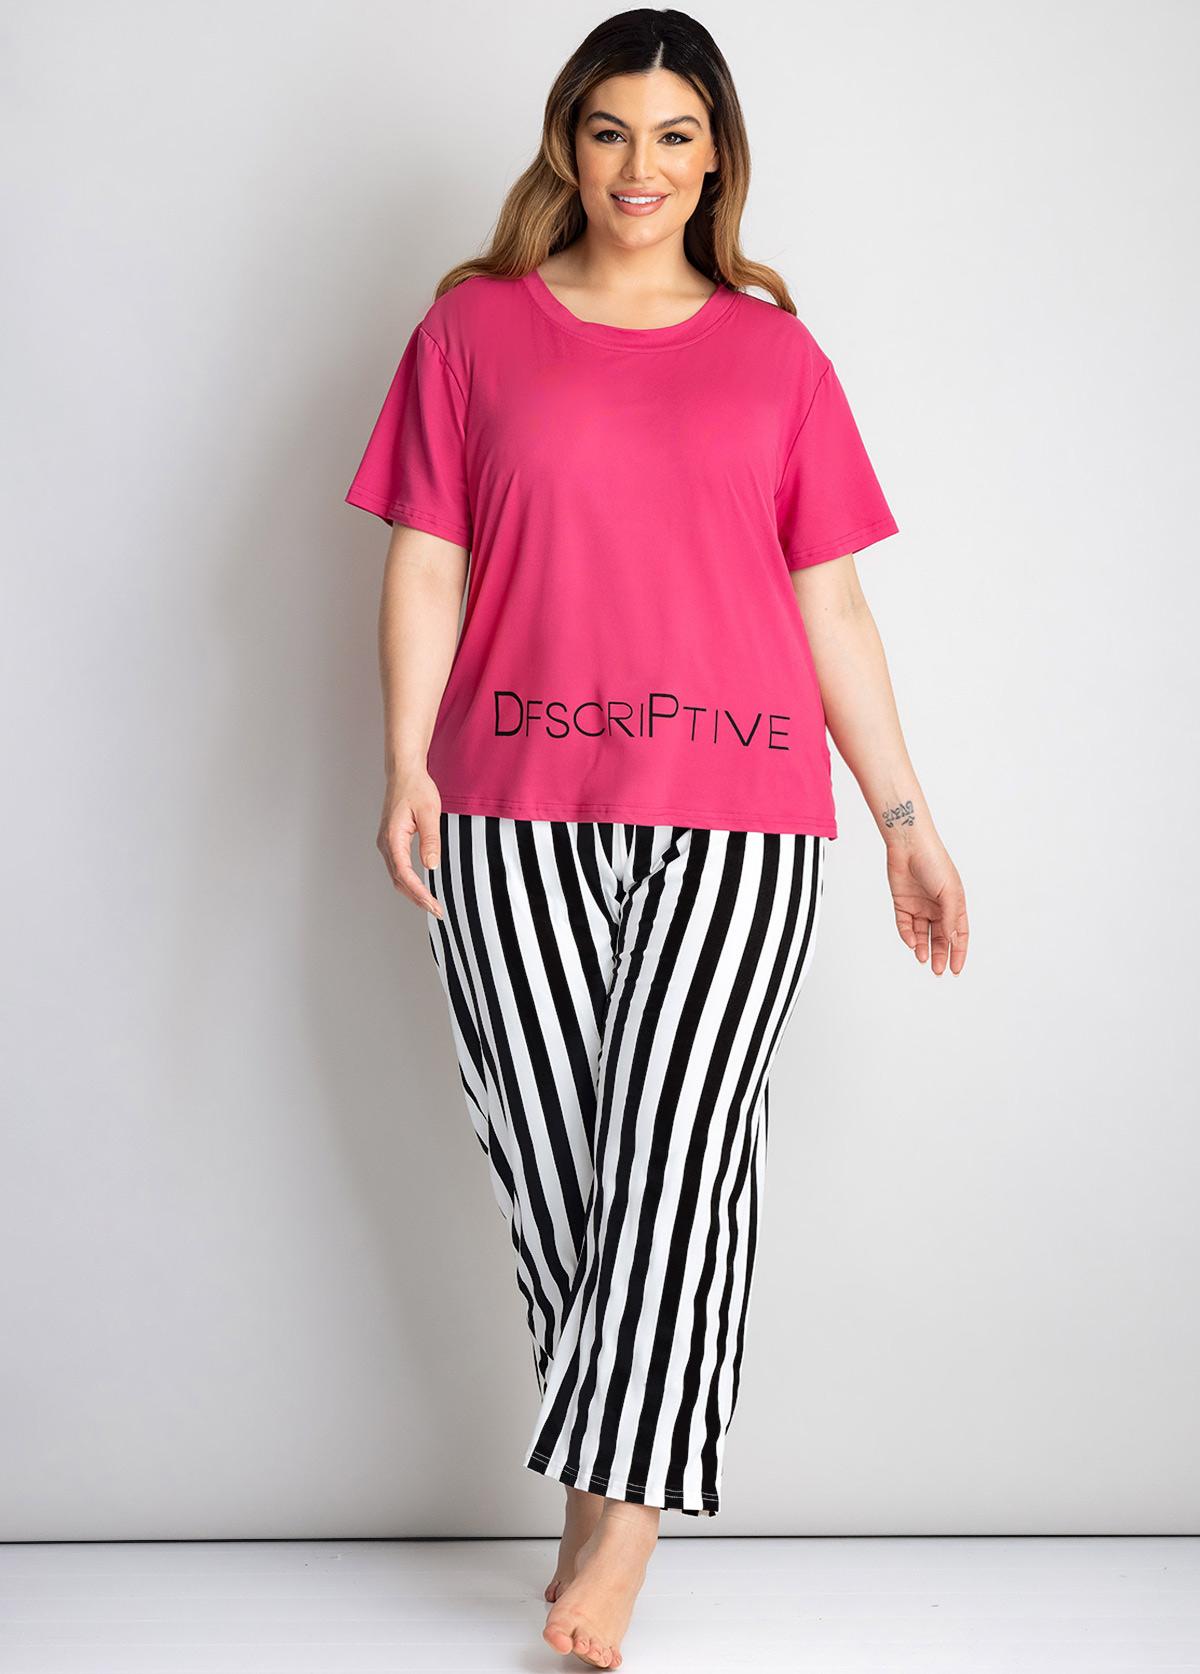 Stripe and Letter Print Plus Size Loungewear Set